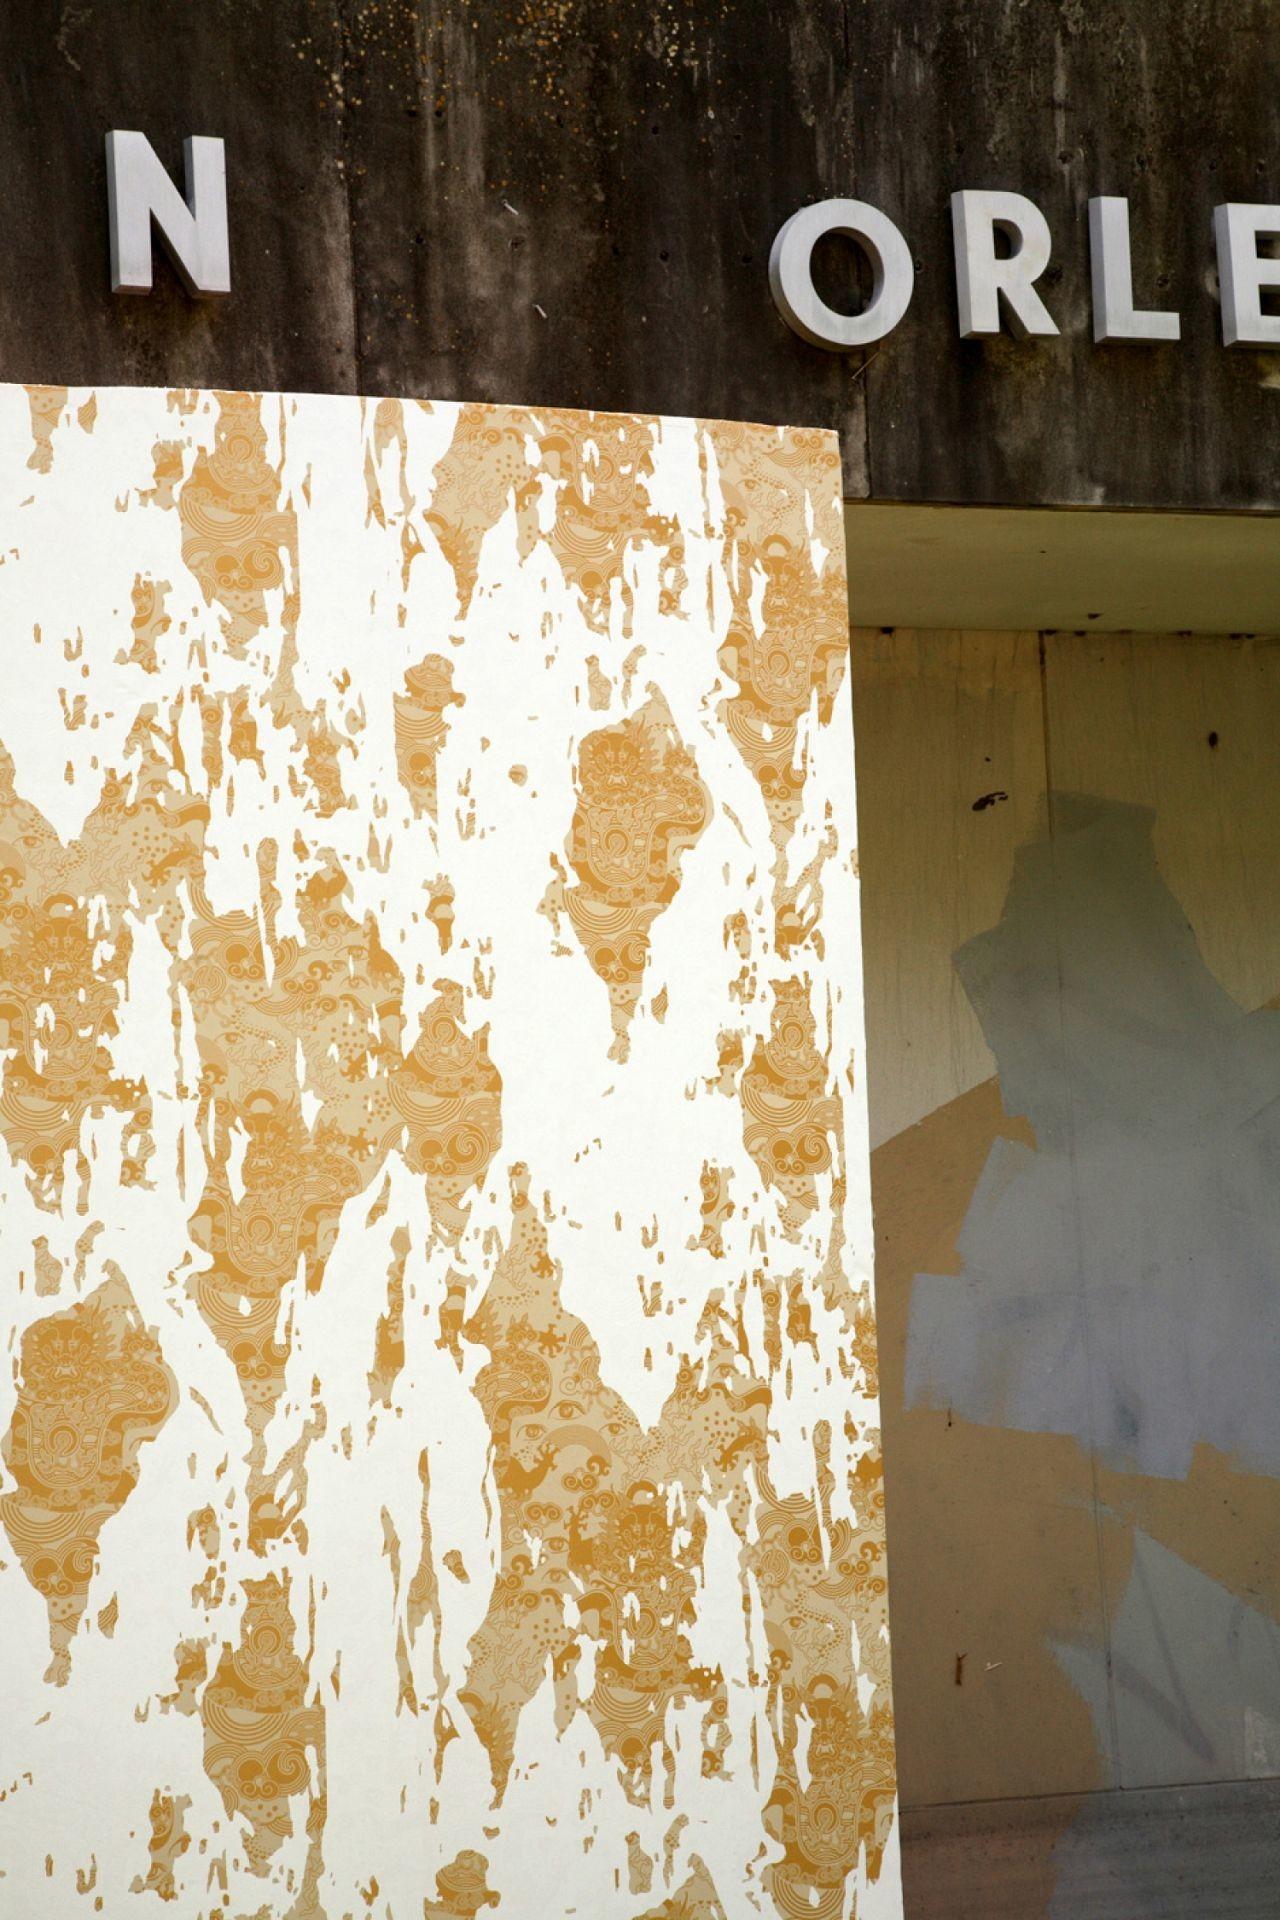 minecraft ender dragon wallpaper 250 | Hd Wallpaper, Blue | Love .